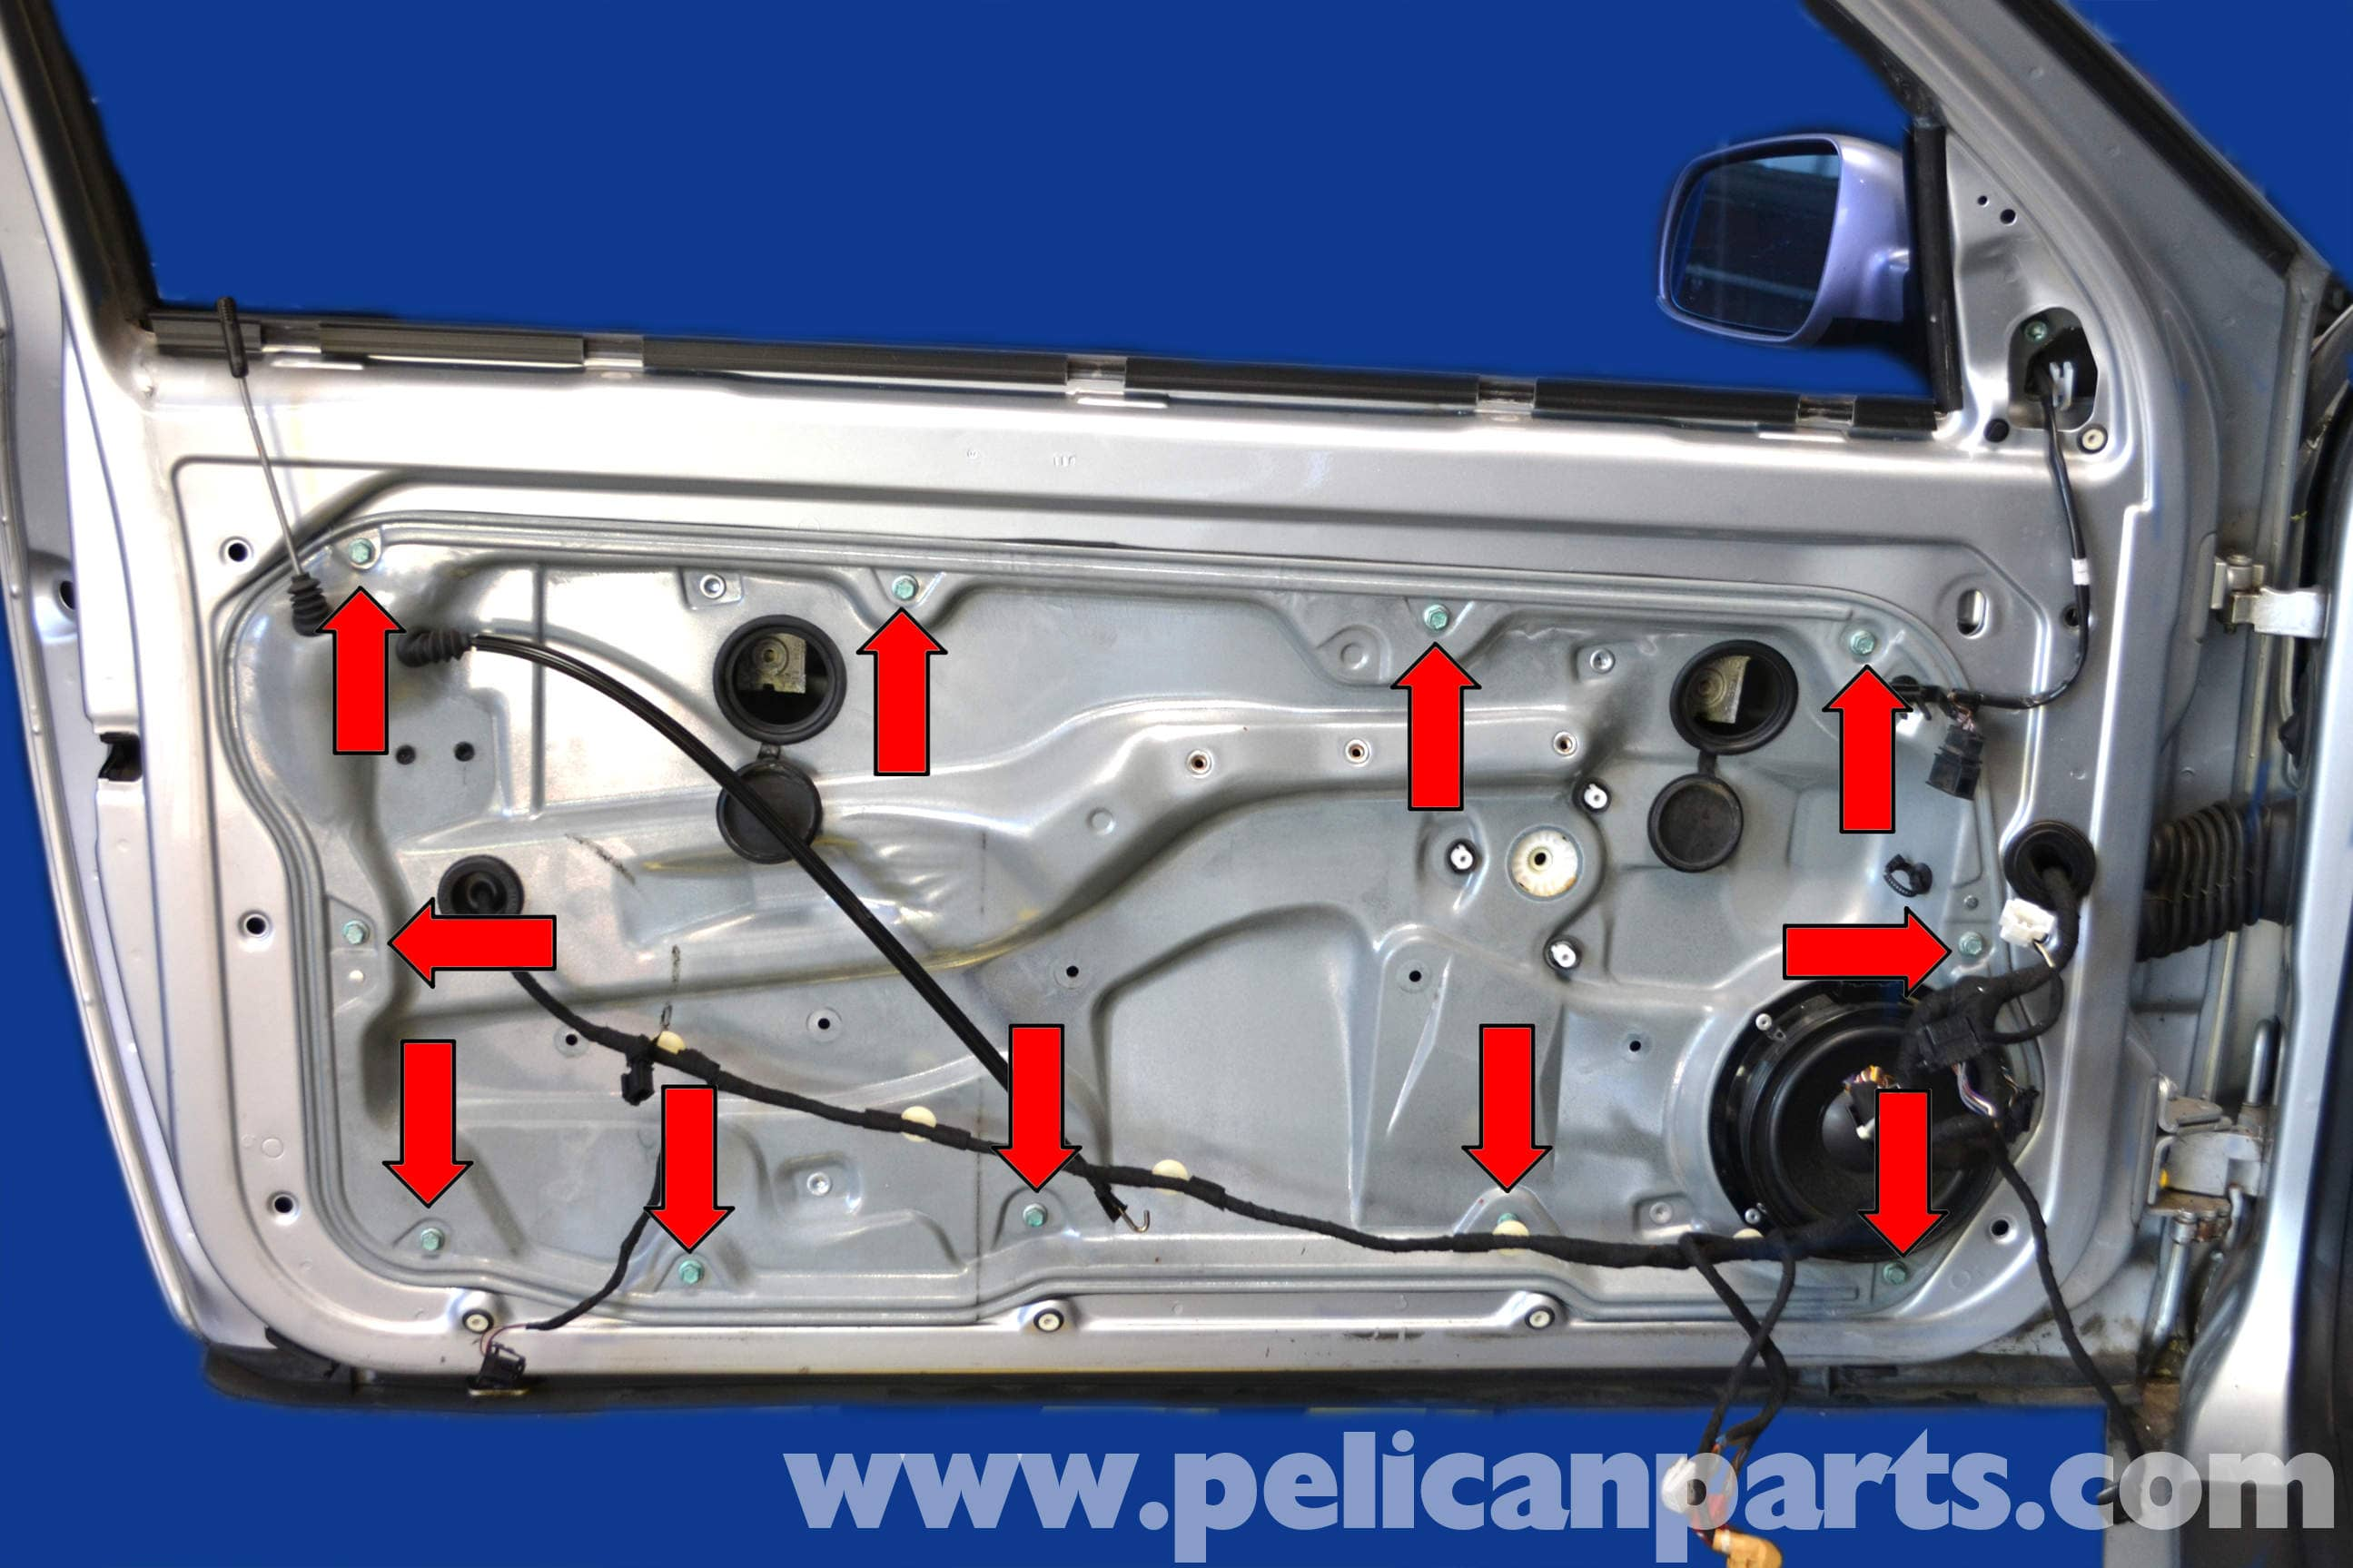 Volkswagen Golf Gti Mk Iv Door Lock Replacement 1999 2005 1998 Beetle Wiring Harness Large Image Extra